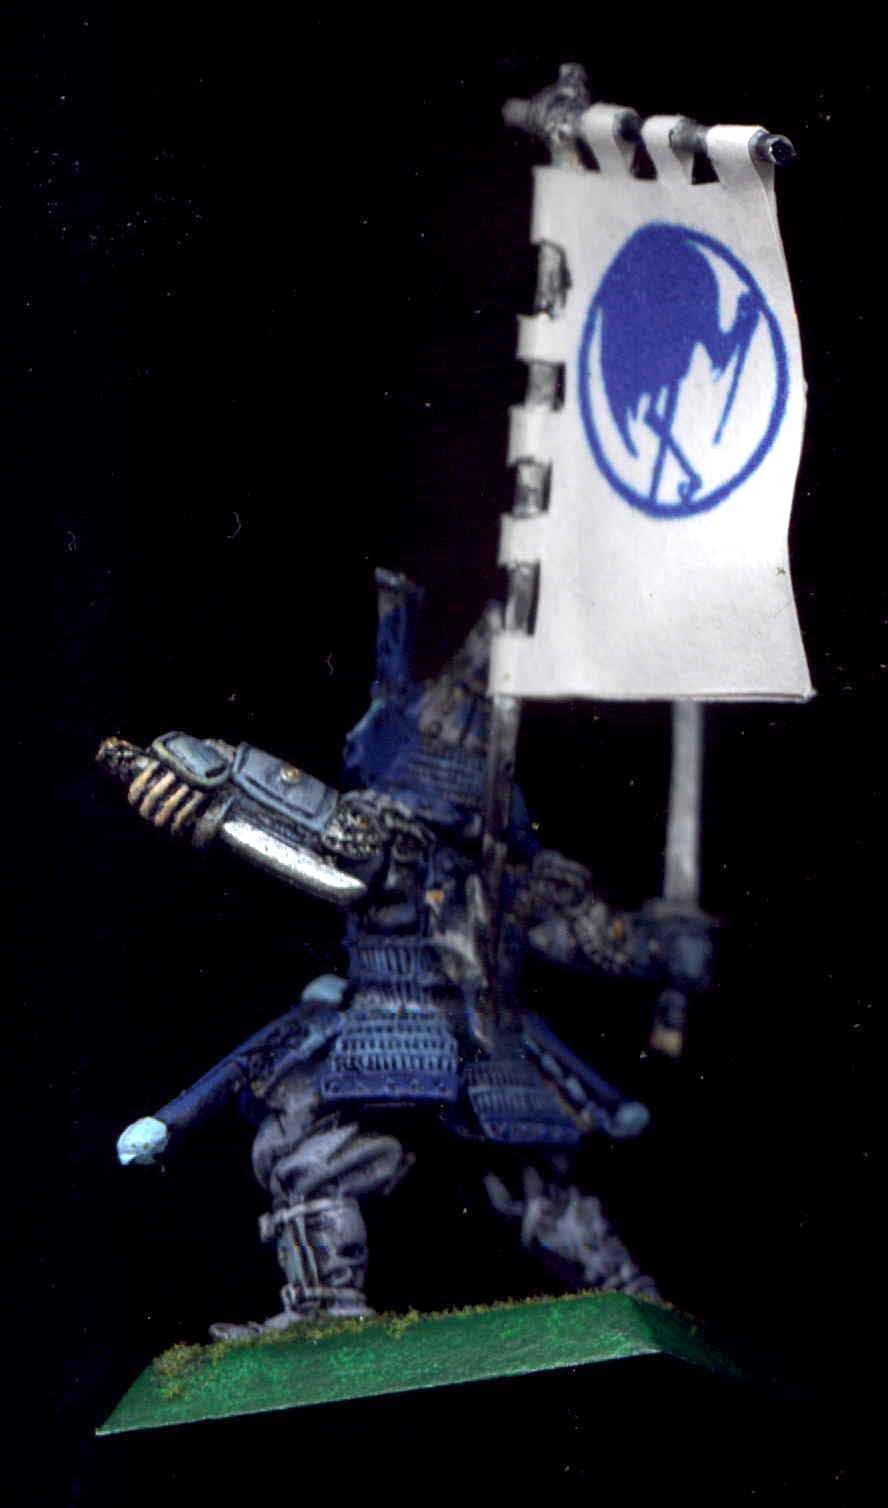 Banner, Blue, Bushi, Character, Clan War, Crane, Daisho, Hashimono, Katana, L5r, Legend Of The Five Rings, Samurai, Wakizashi, White